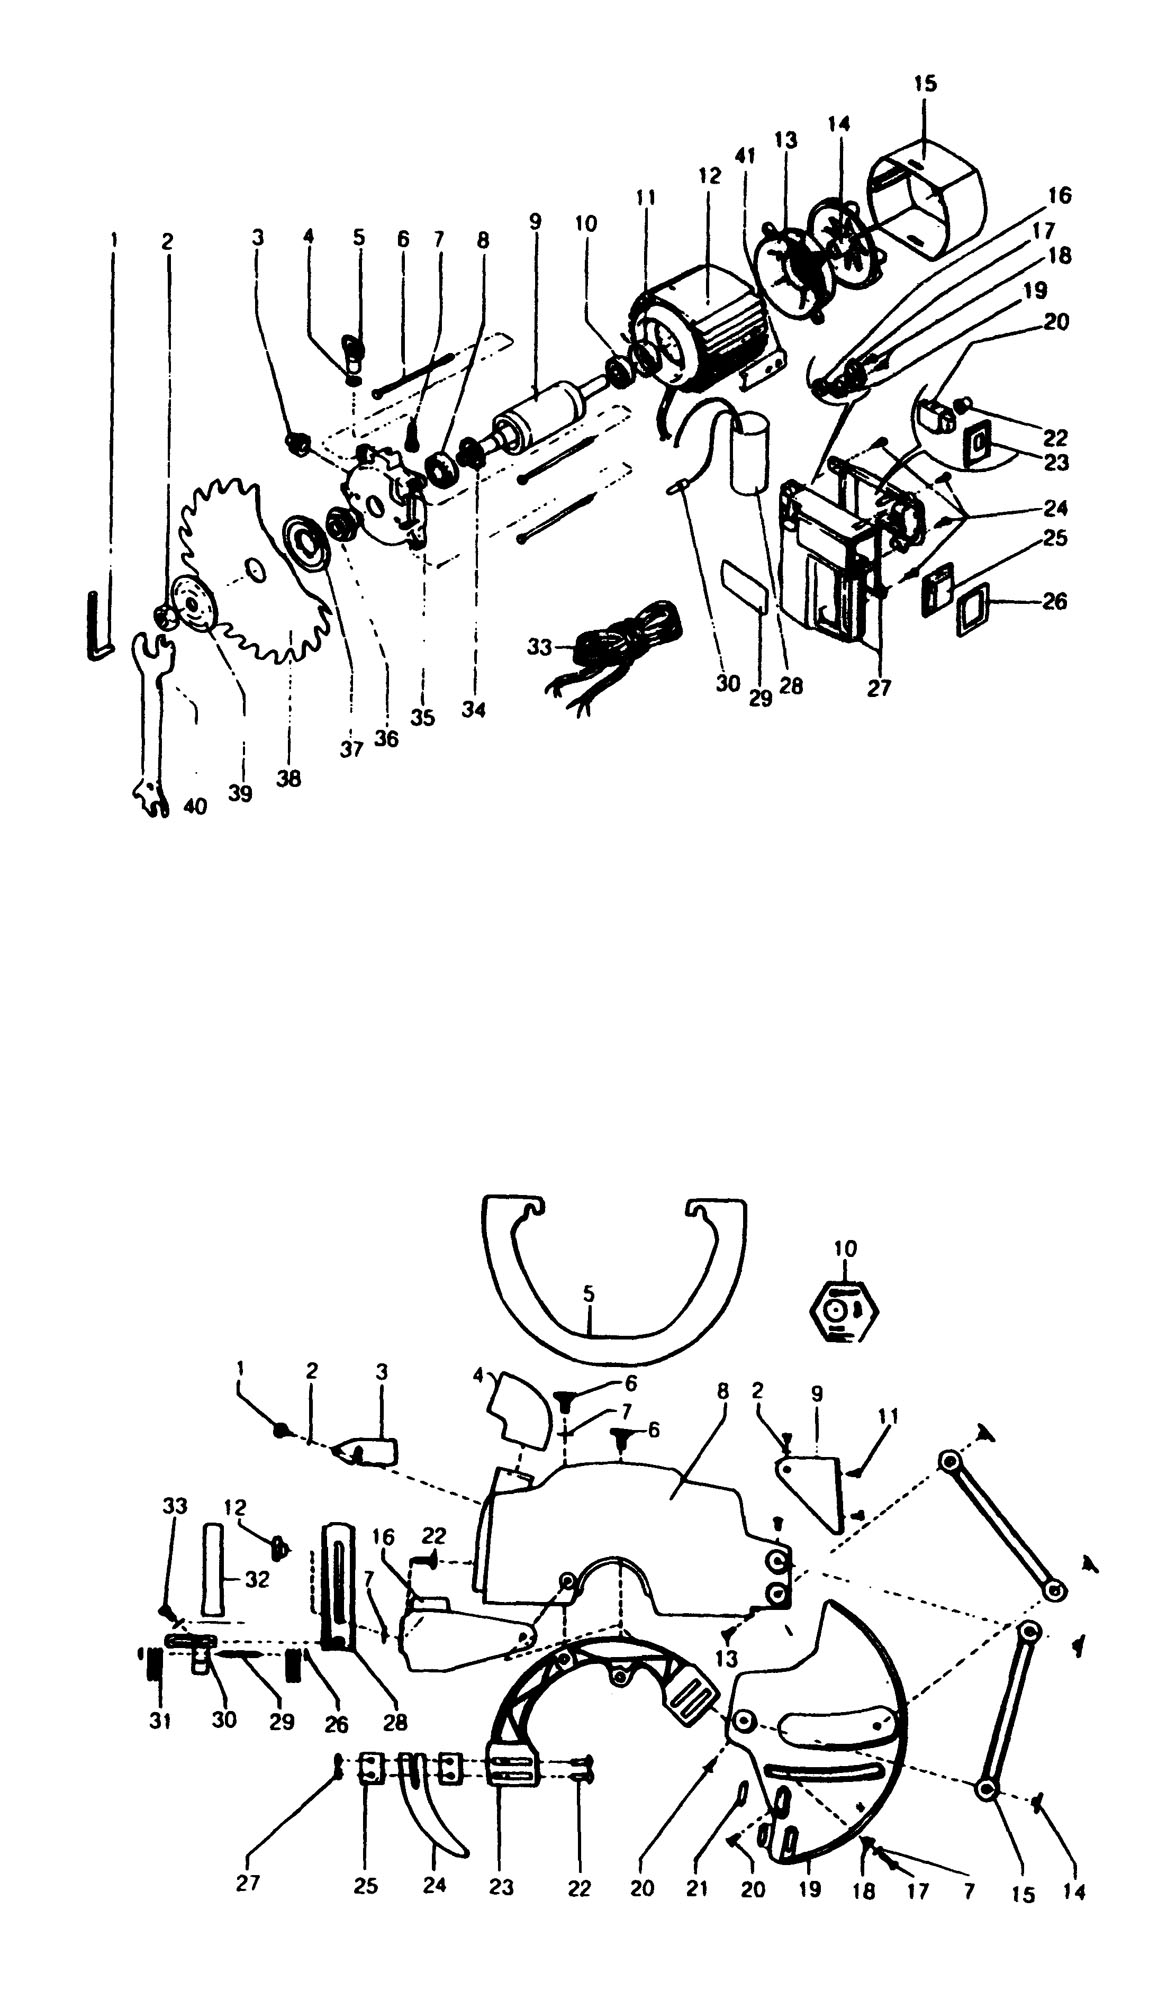 spares for dewalt dw320 b radial arm saw  type 1 dewalt 770 radial arm saw parts list dewalt 770 radial arm saw parts list